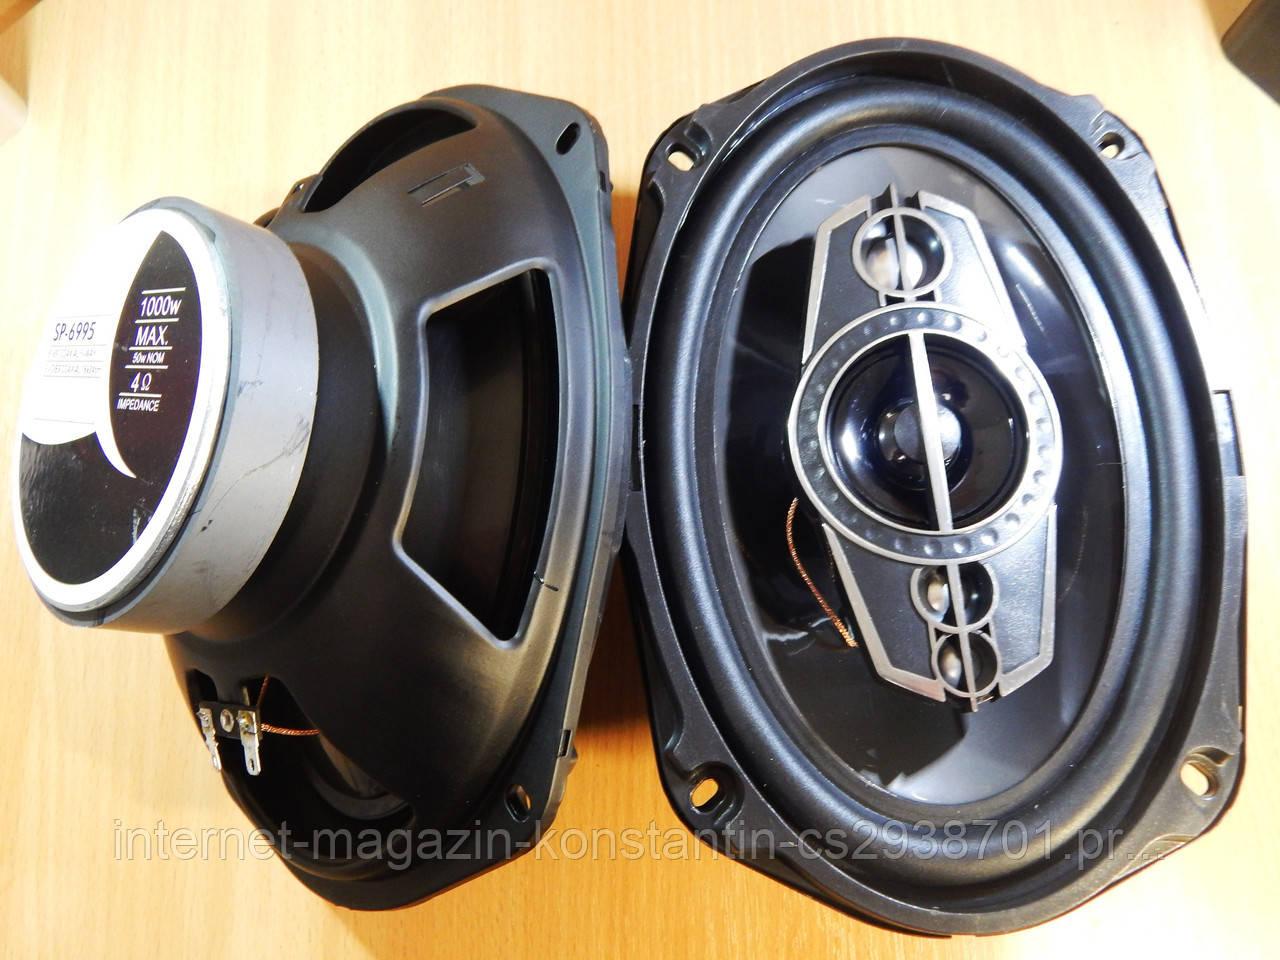 Автомобильная акустика овалы Pioneer SP-A6995 6x9 овалы (1000W) Супер Звук!